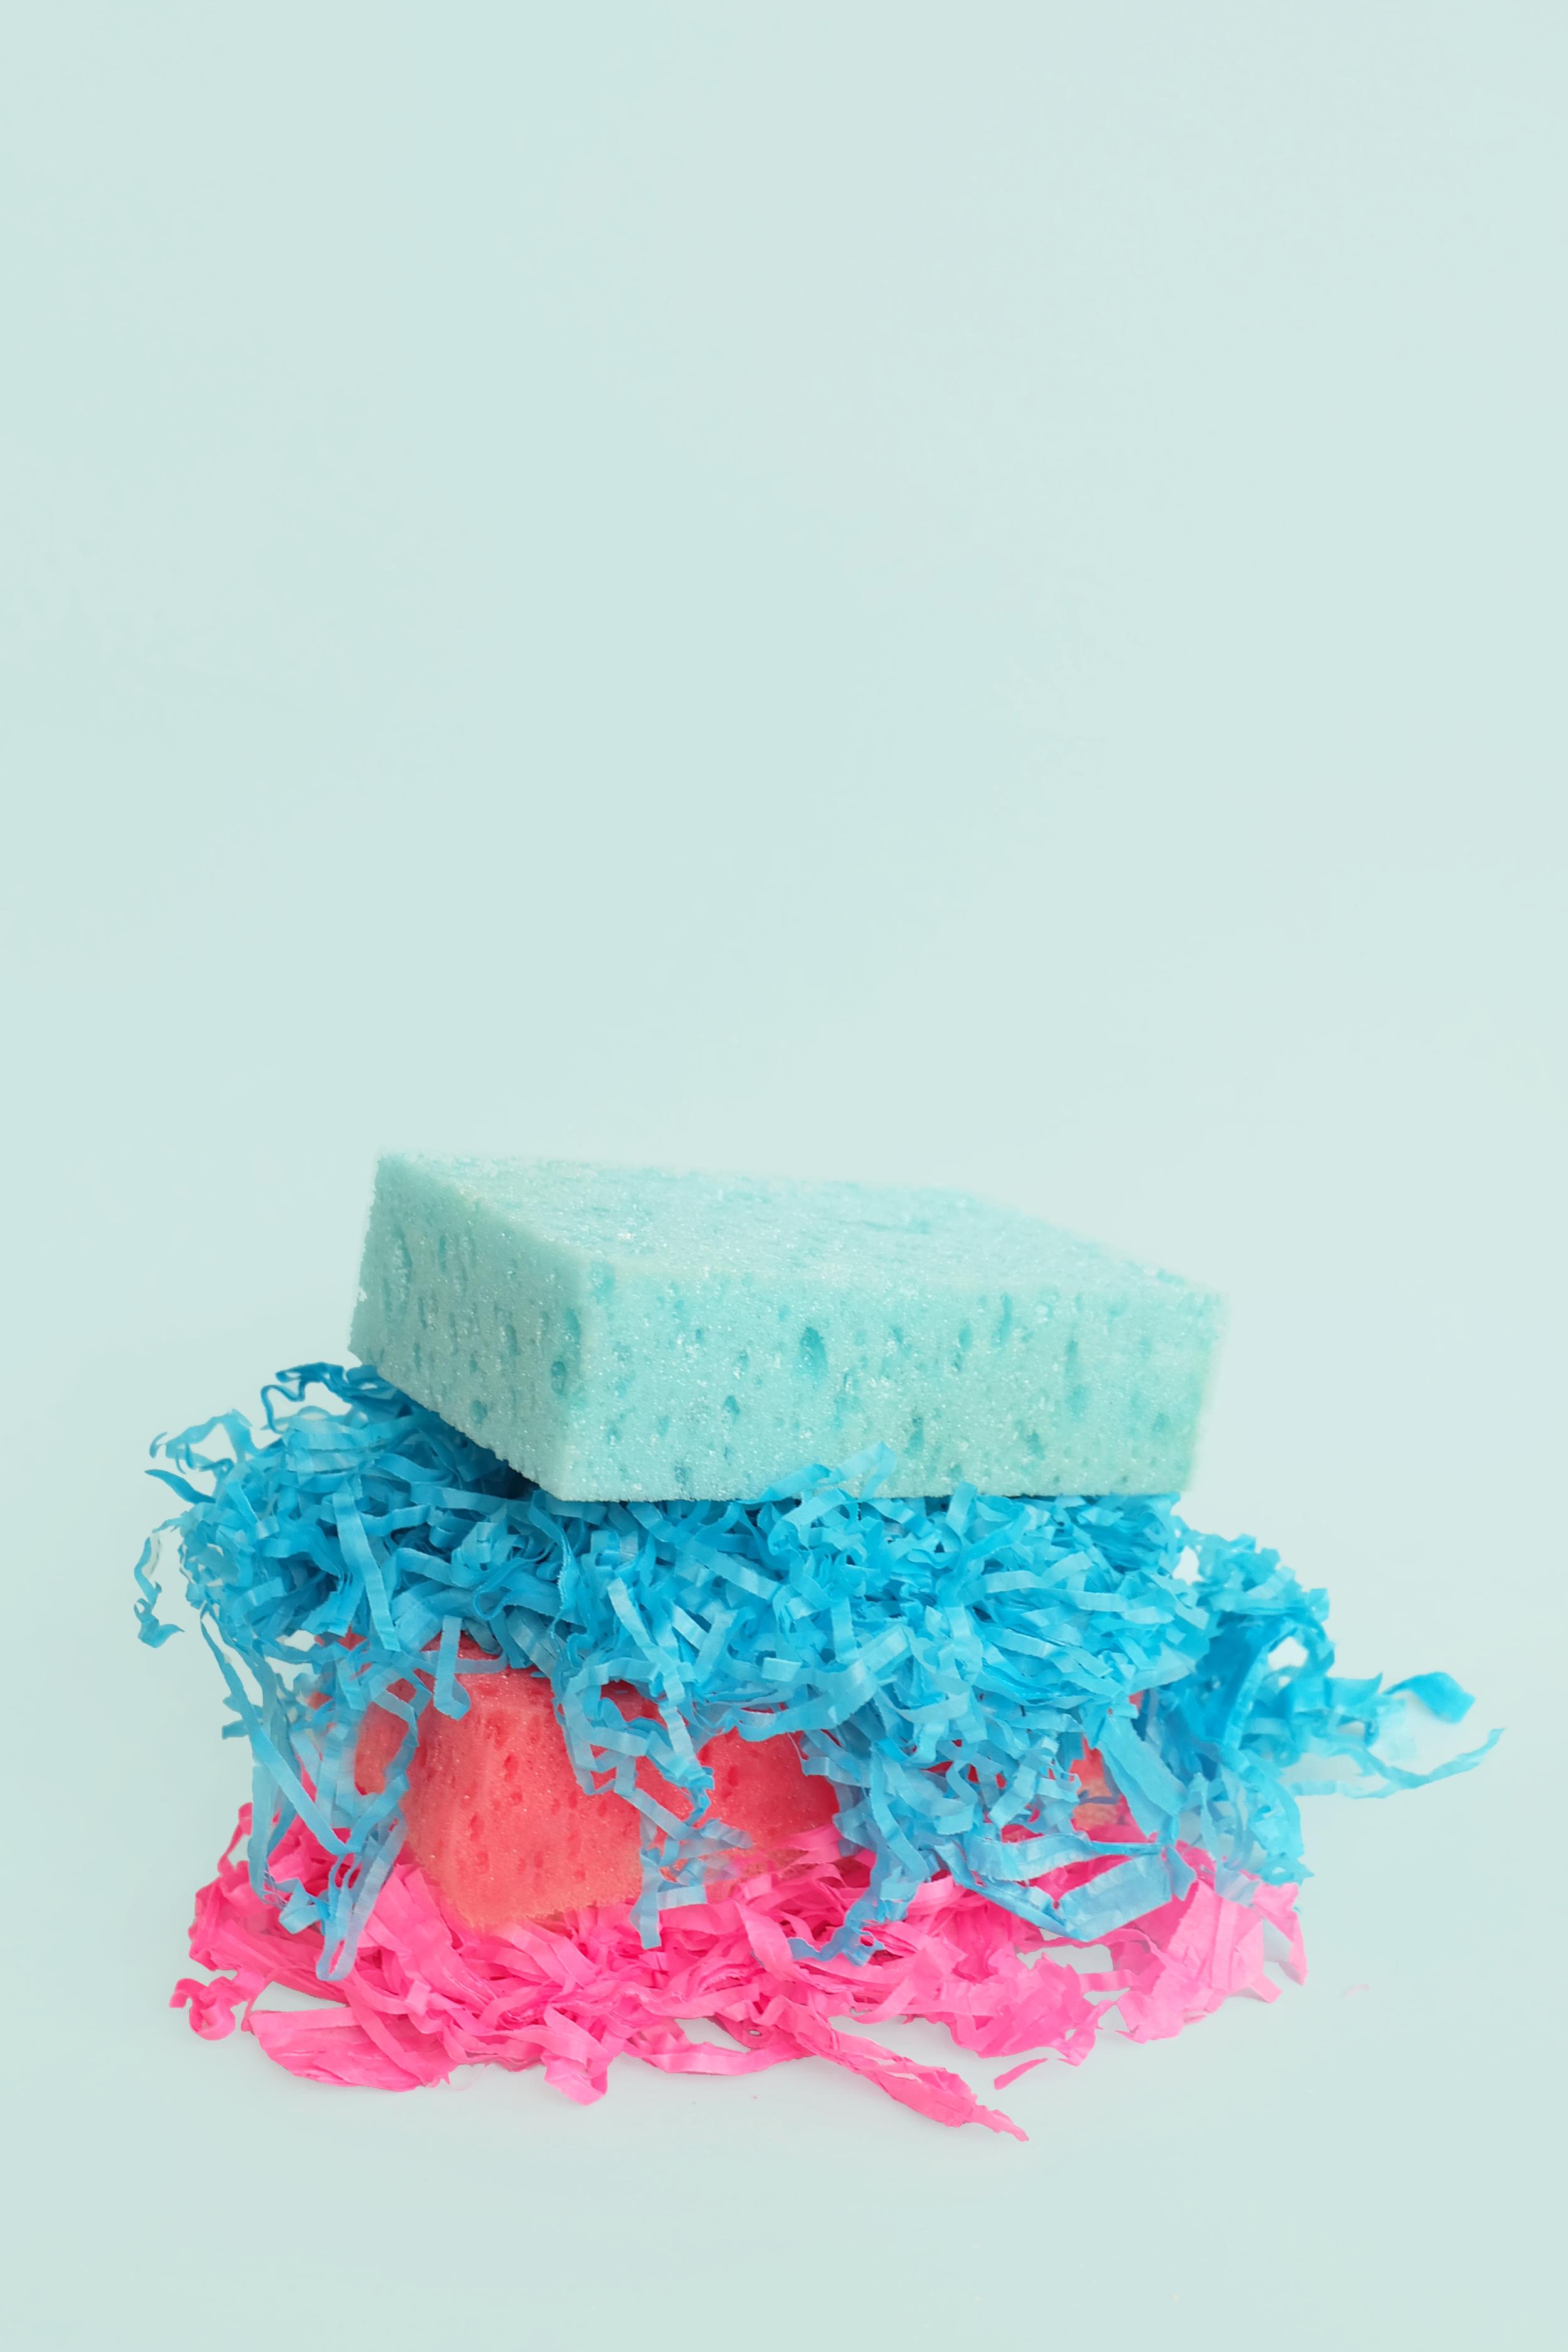 spongeconfetti_adjustments_crop.png